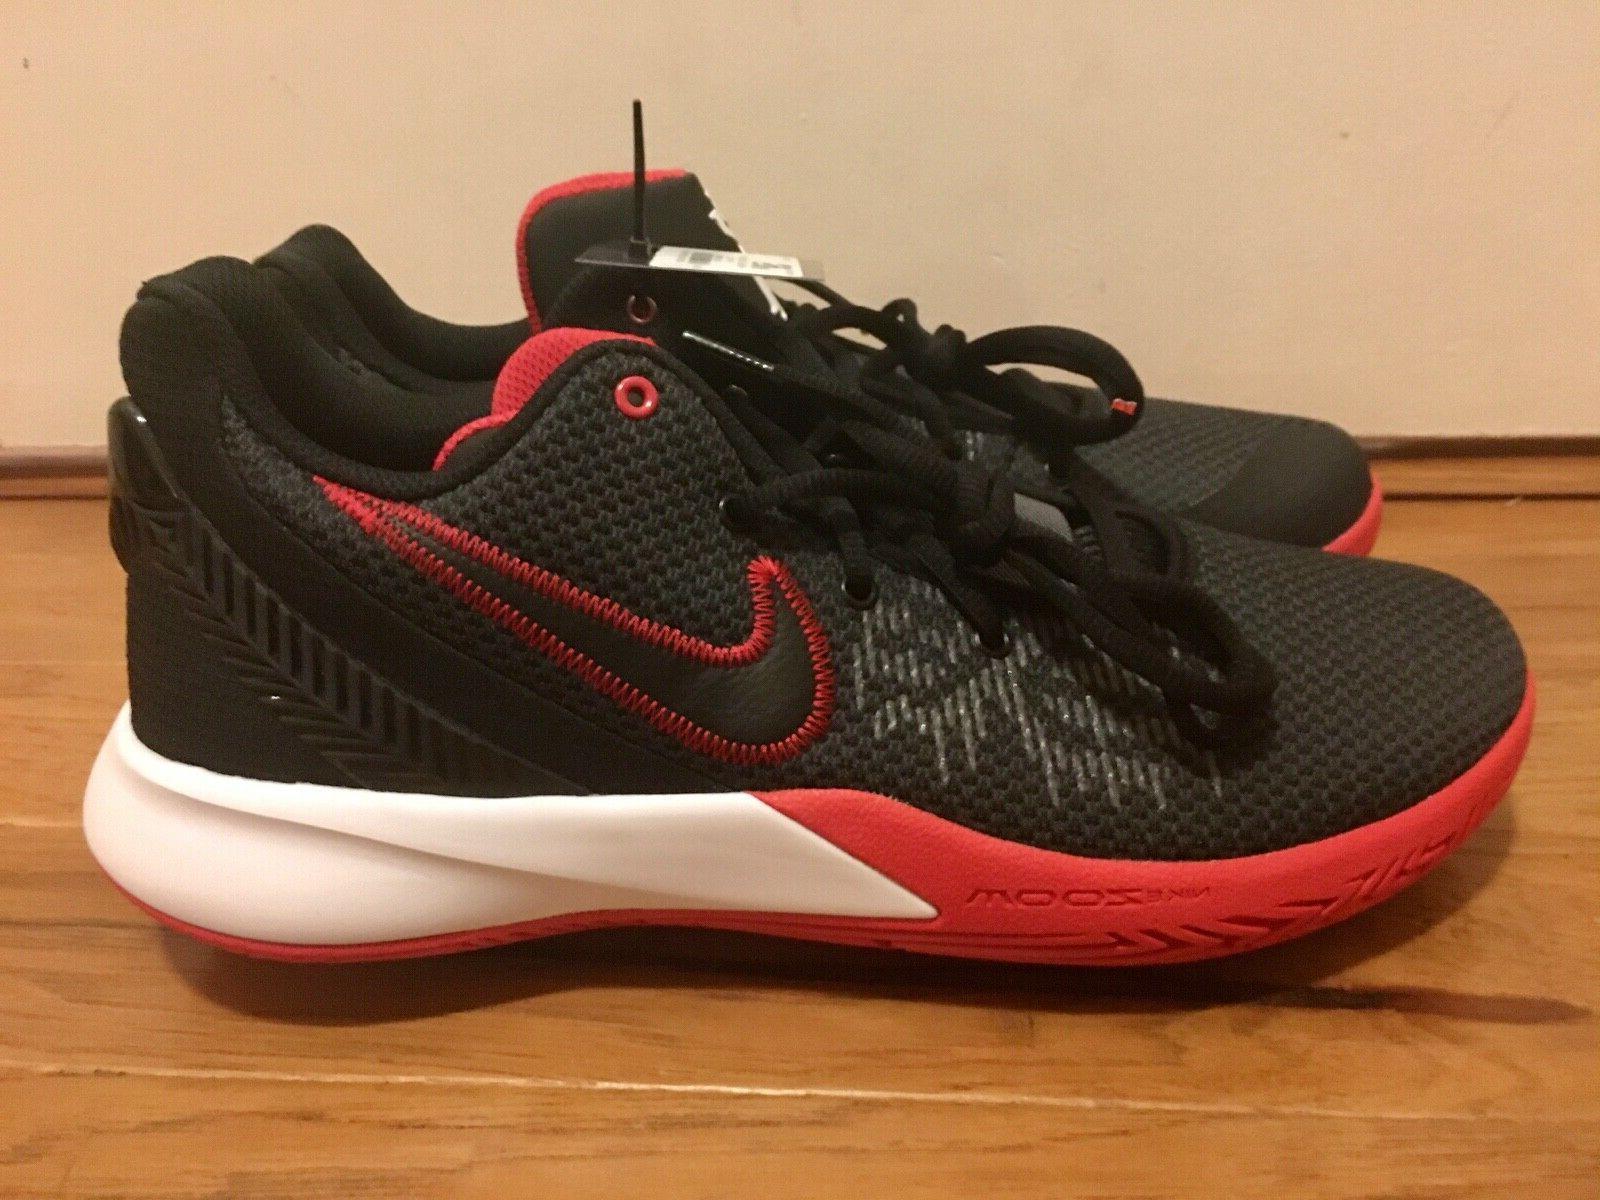 Nike Flytrap Mens Size: 10.5 Shoes